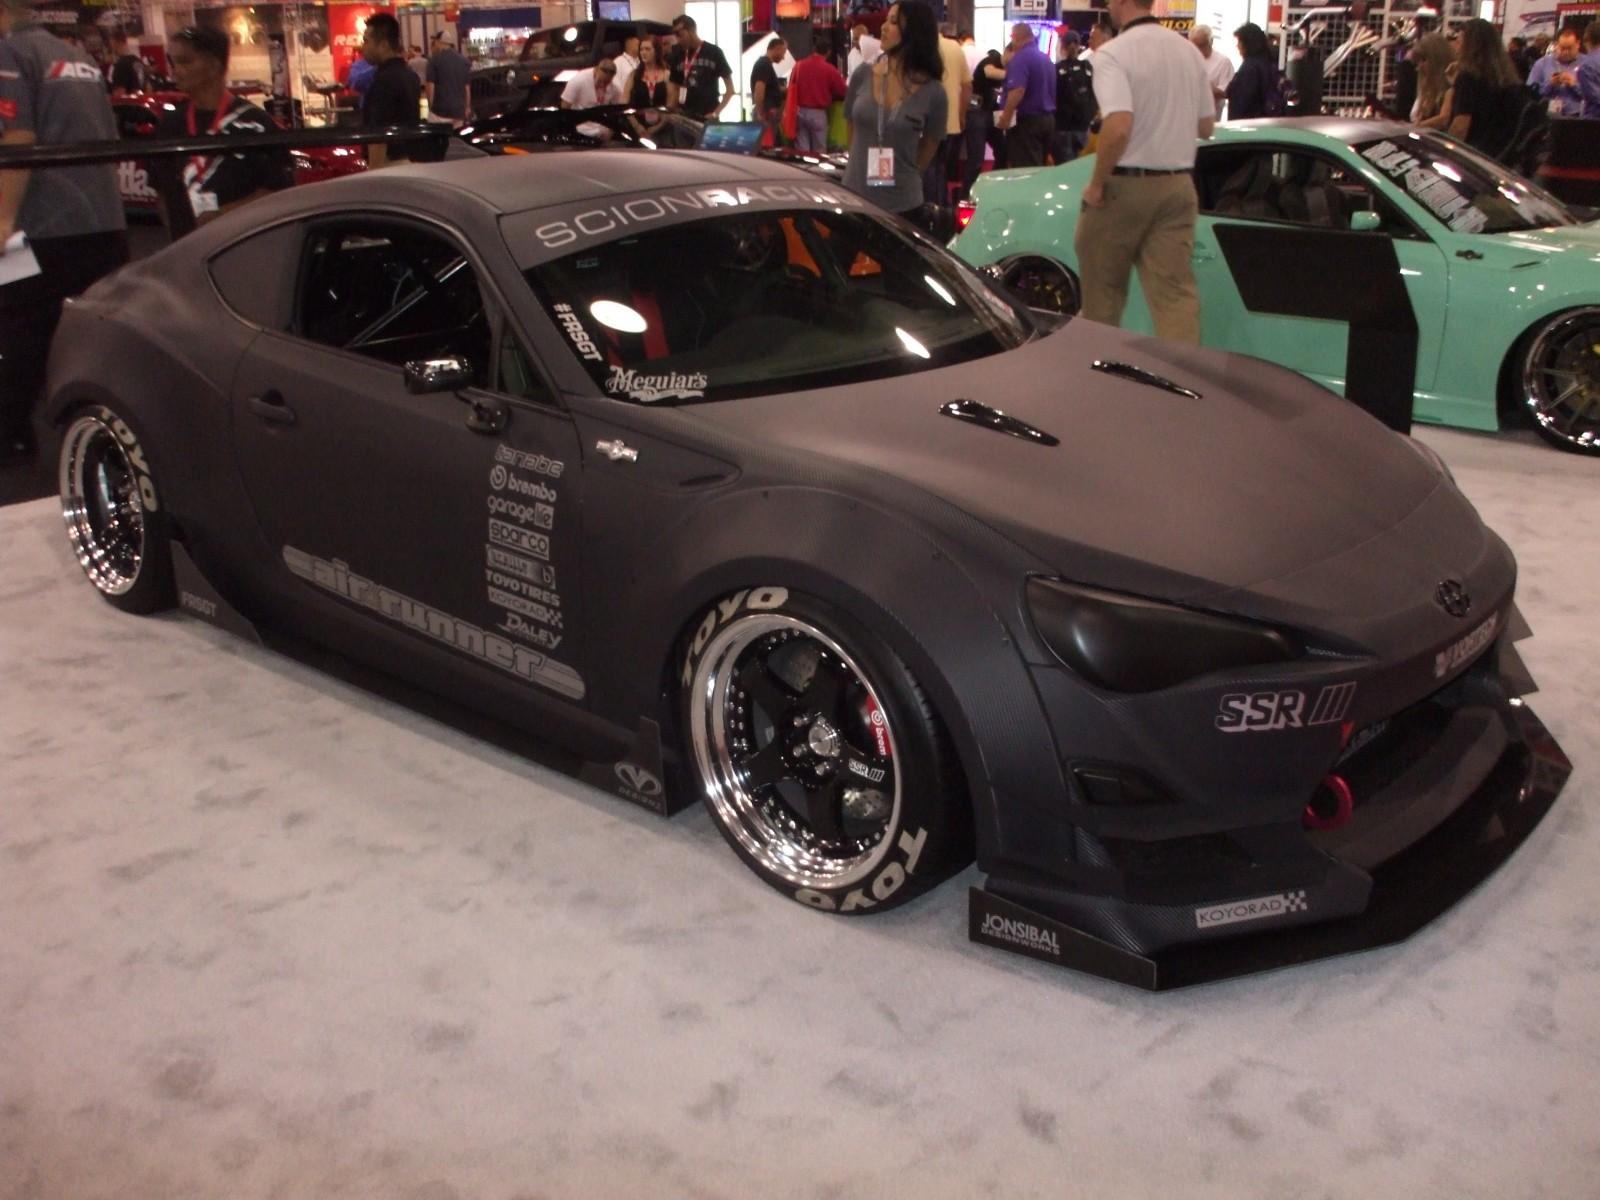 SEMA Photo Gallery: Hot Rods, Customs & Super Cars - OnAllCylinders